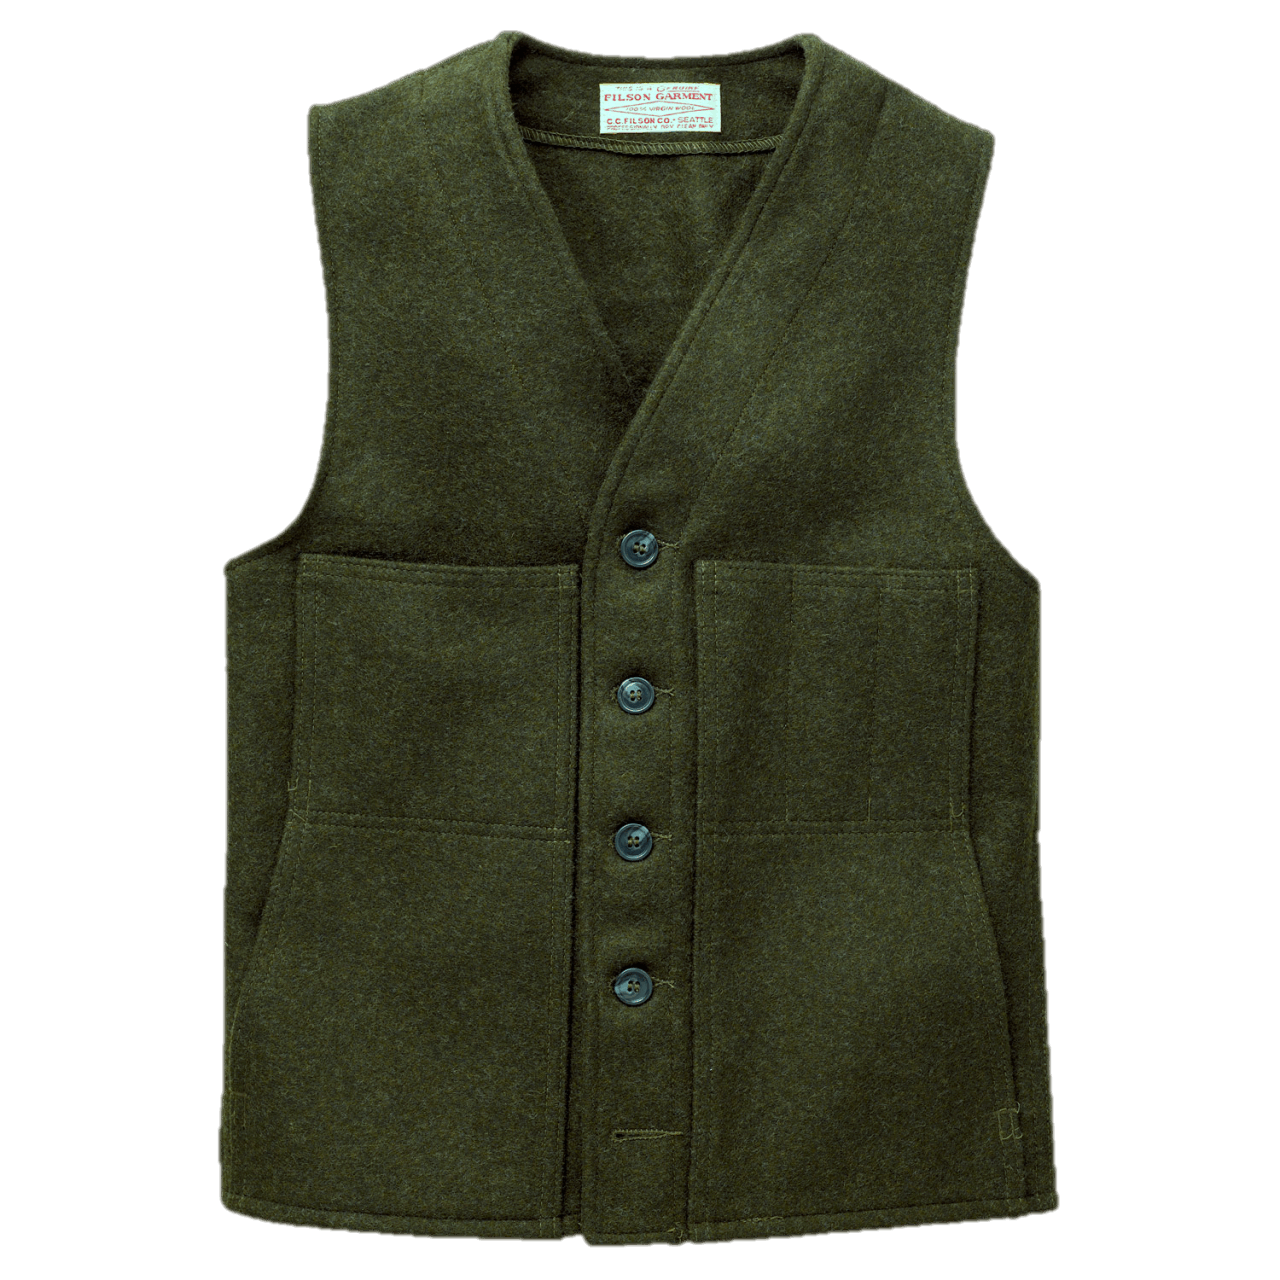 Filson Mackinaw Wool Vest - Forrest Green